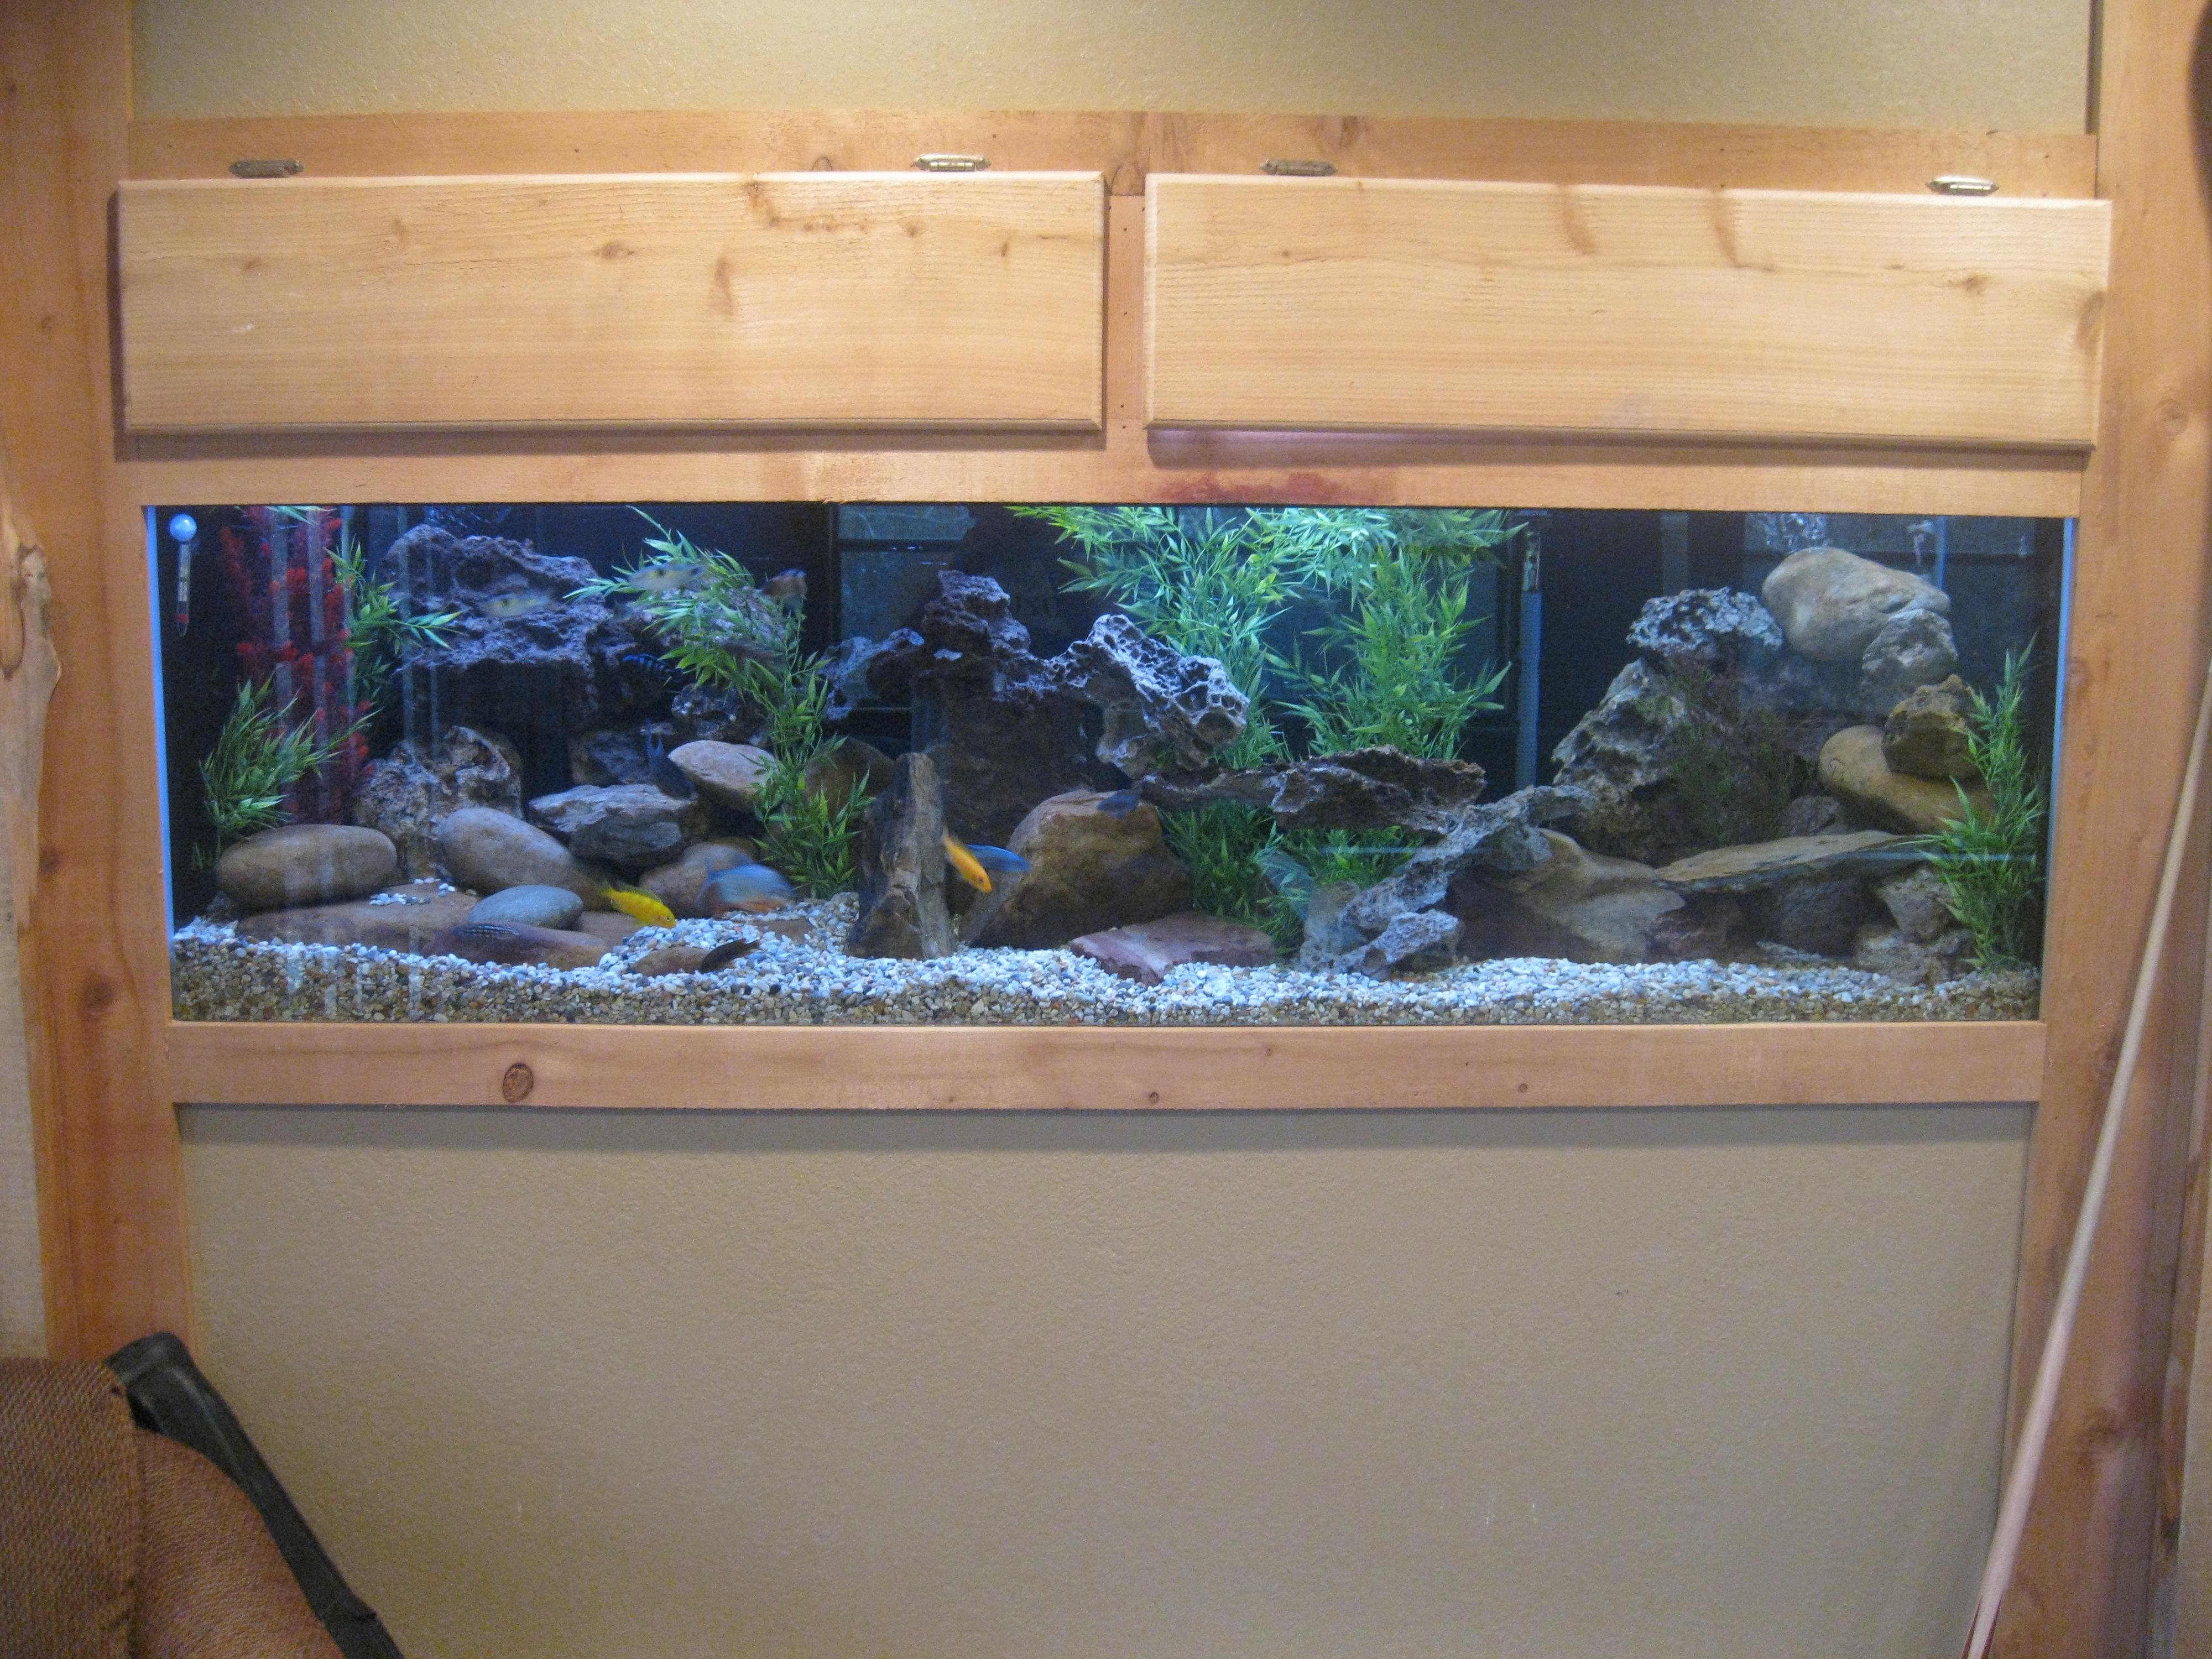 125 Gallon Fish Tank Related Keywords & Suggestions - 125 Gallon Fish ...